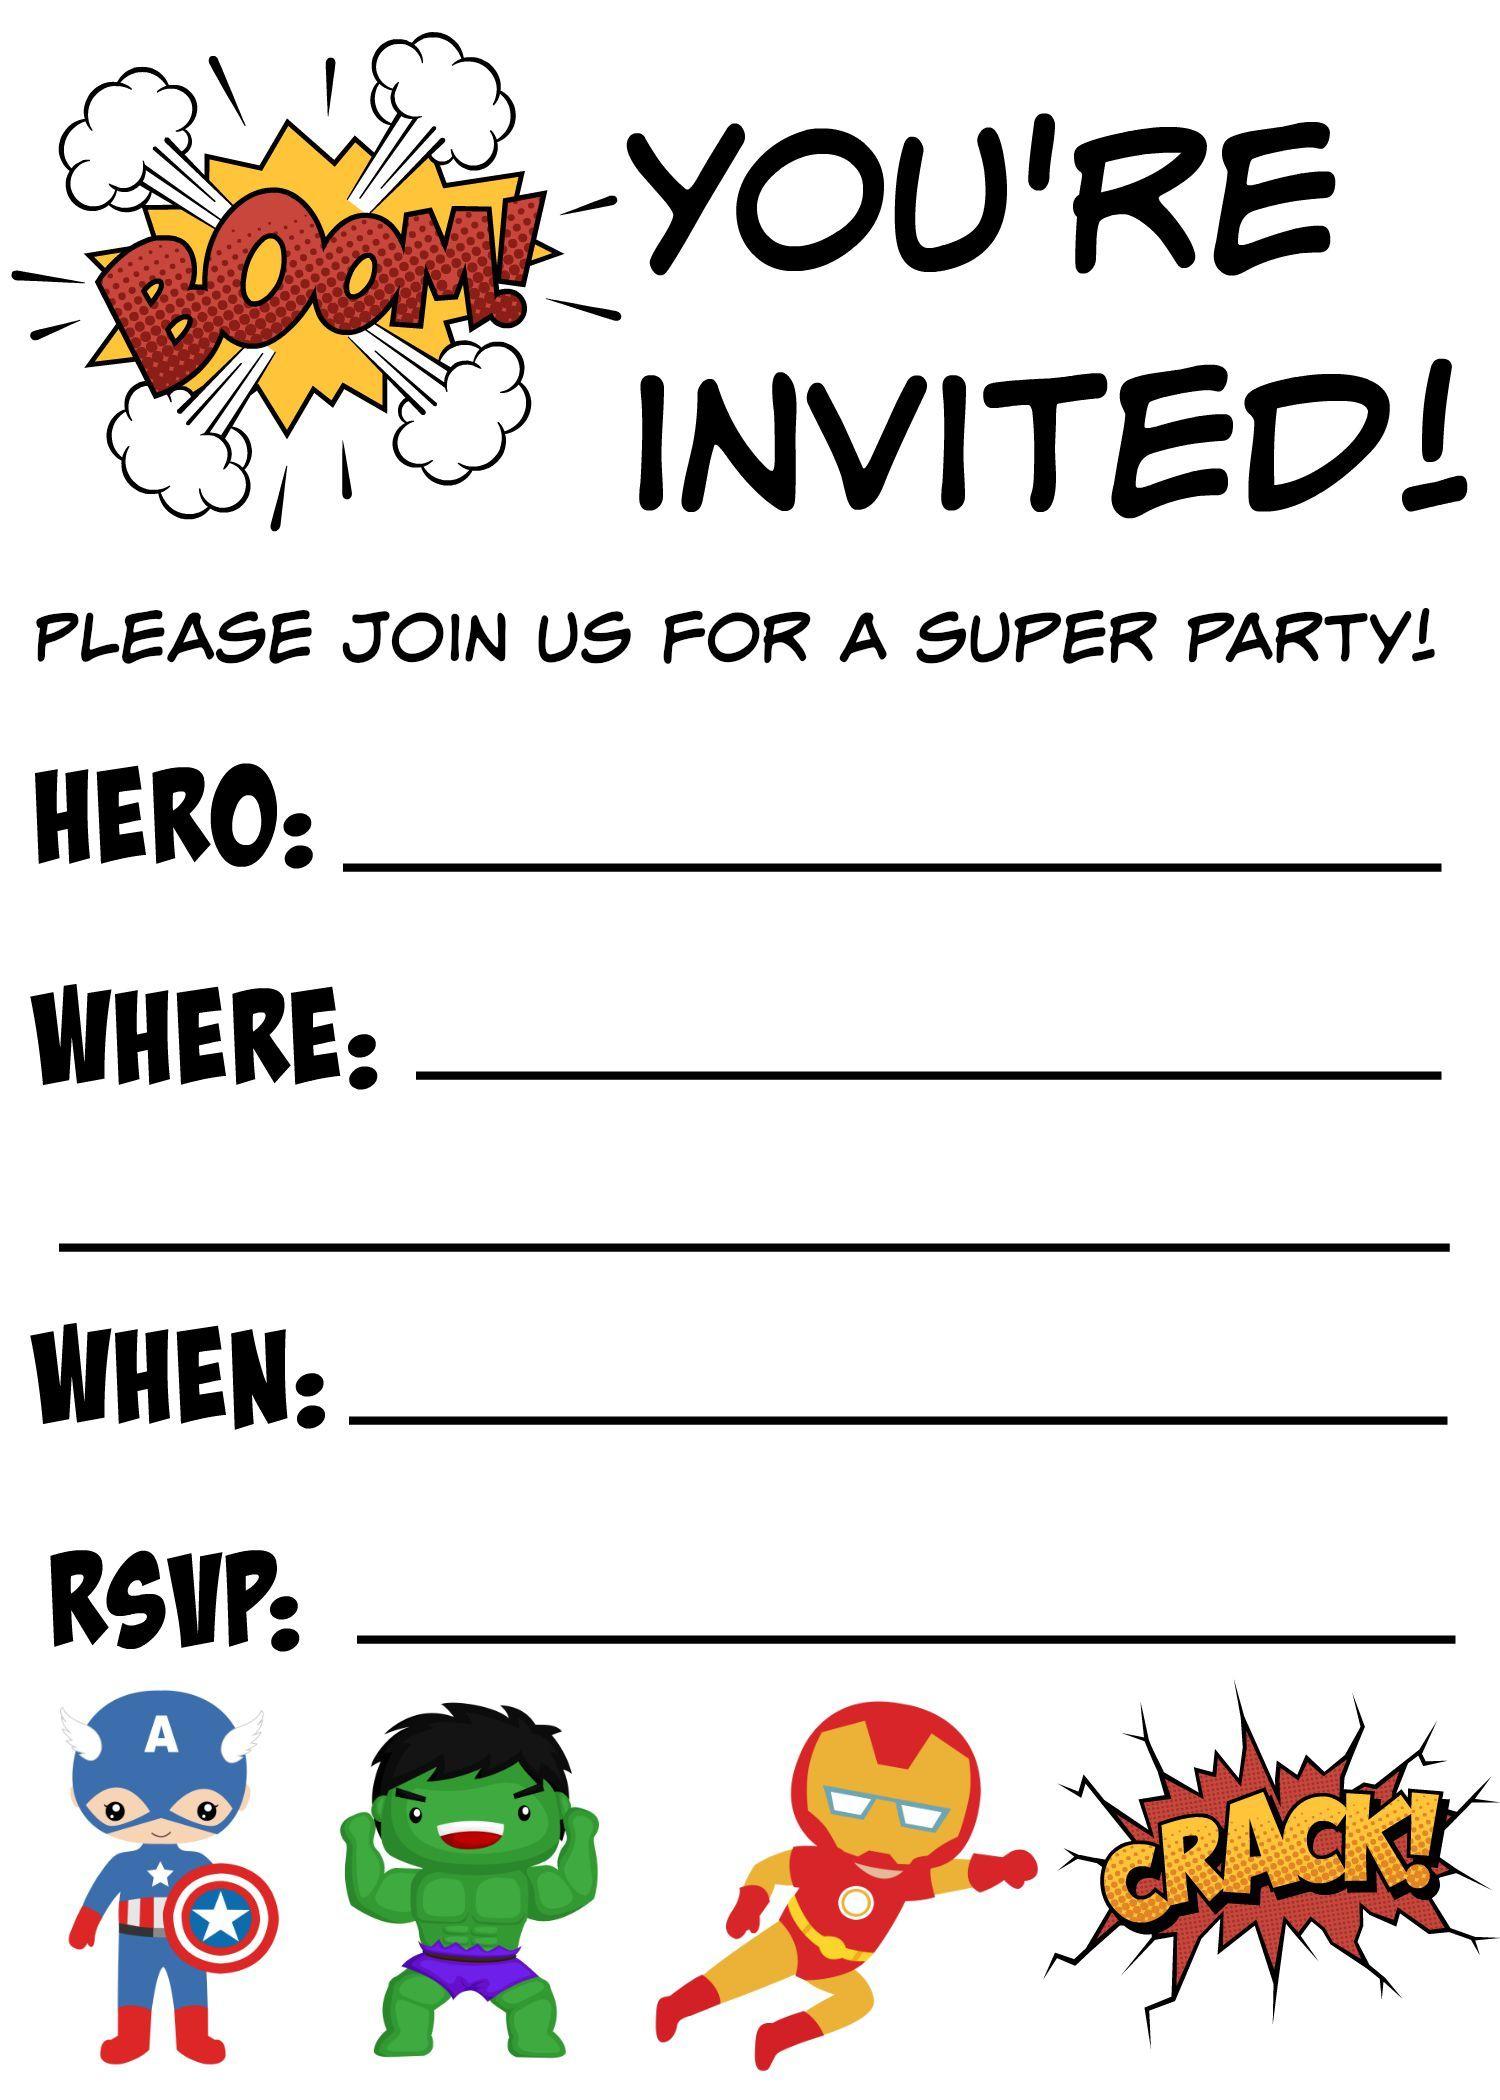 Free Printable Superhero Birthday Invitations | Birthdays - Free Printable Birthday Invitations Pinterest